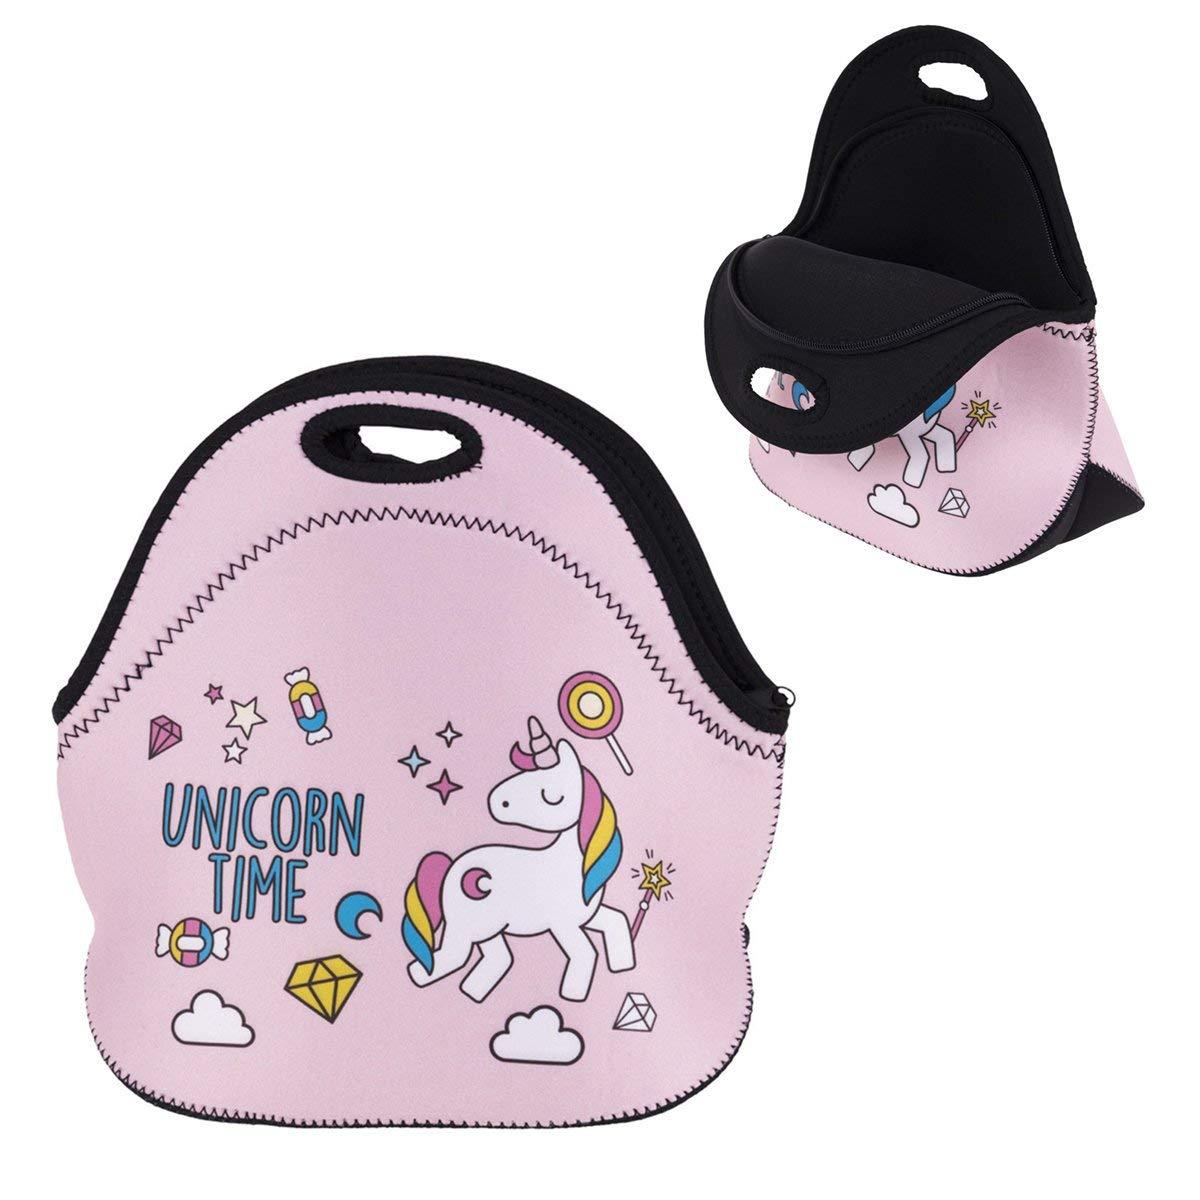 IPRee Neoprene Girl Unicorn Tote Insulated Lunch Cooler Travel Picnic Handbag Pouch